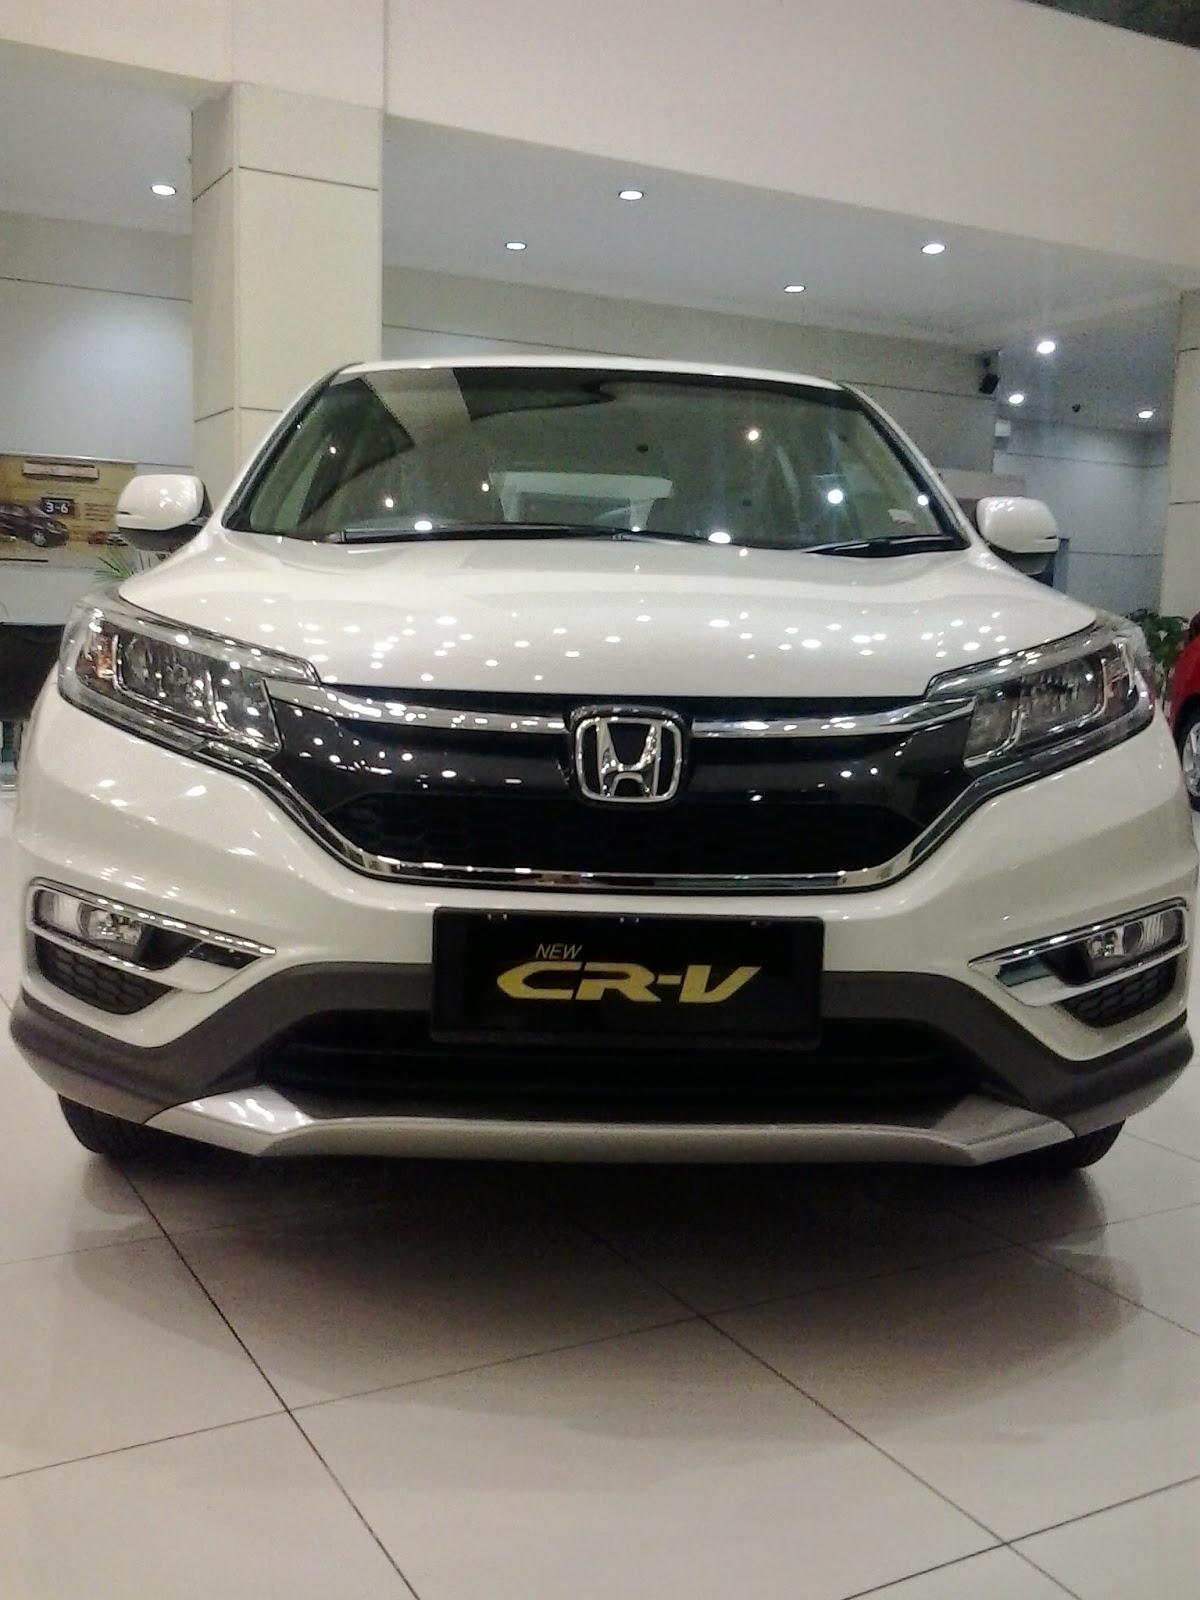 Lokasi Pameran Mobil Honda Bekasi Di Mall Terdekat